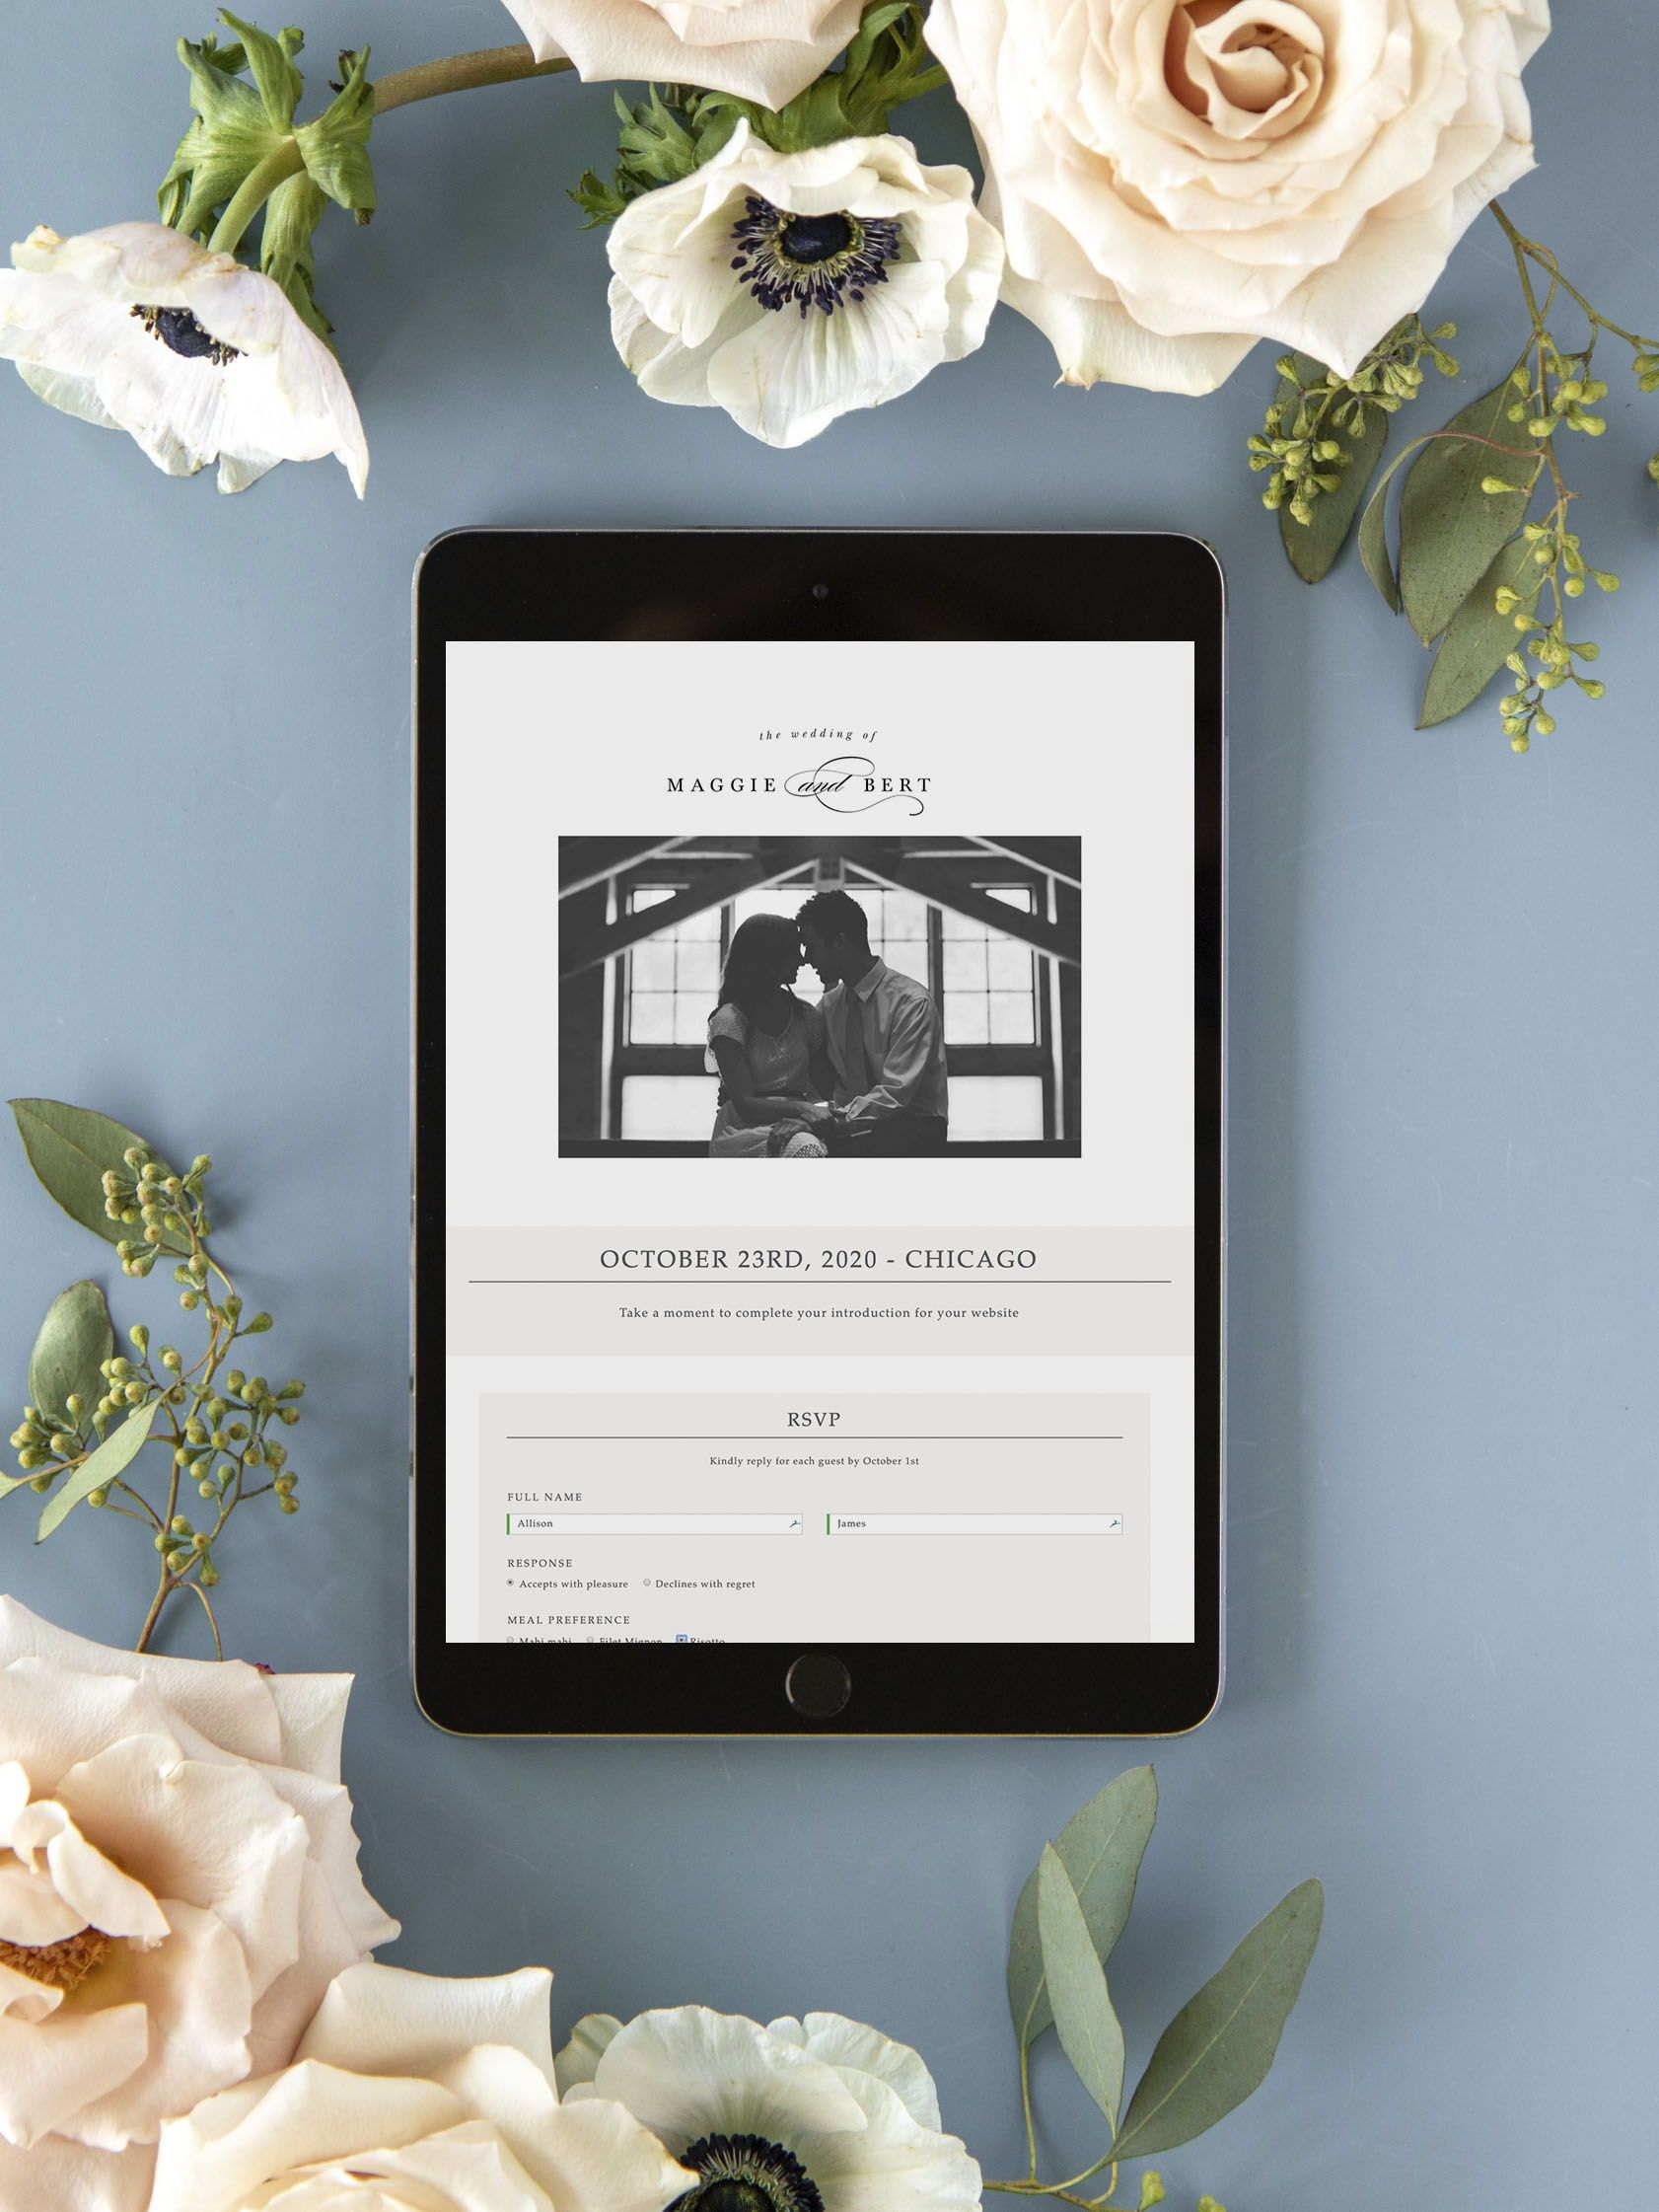 Classic Photo Wedding Website Free Wedding Websites Low Waste Wedding Invitations In 2020 Wedding Website Free Wedding Website Rsvp Wedding Website